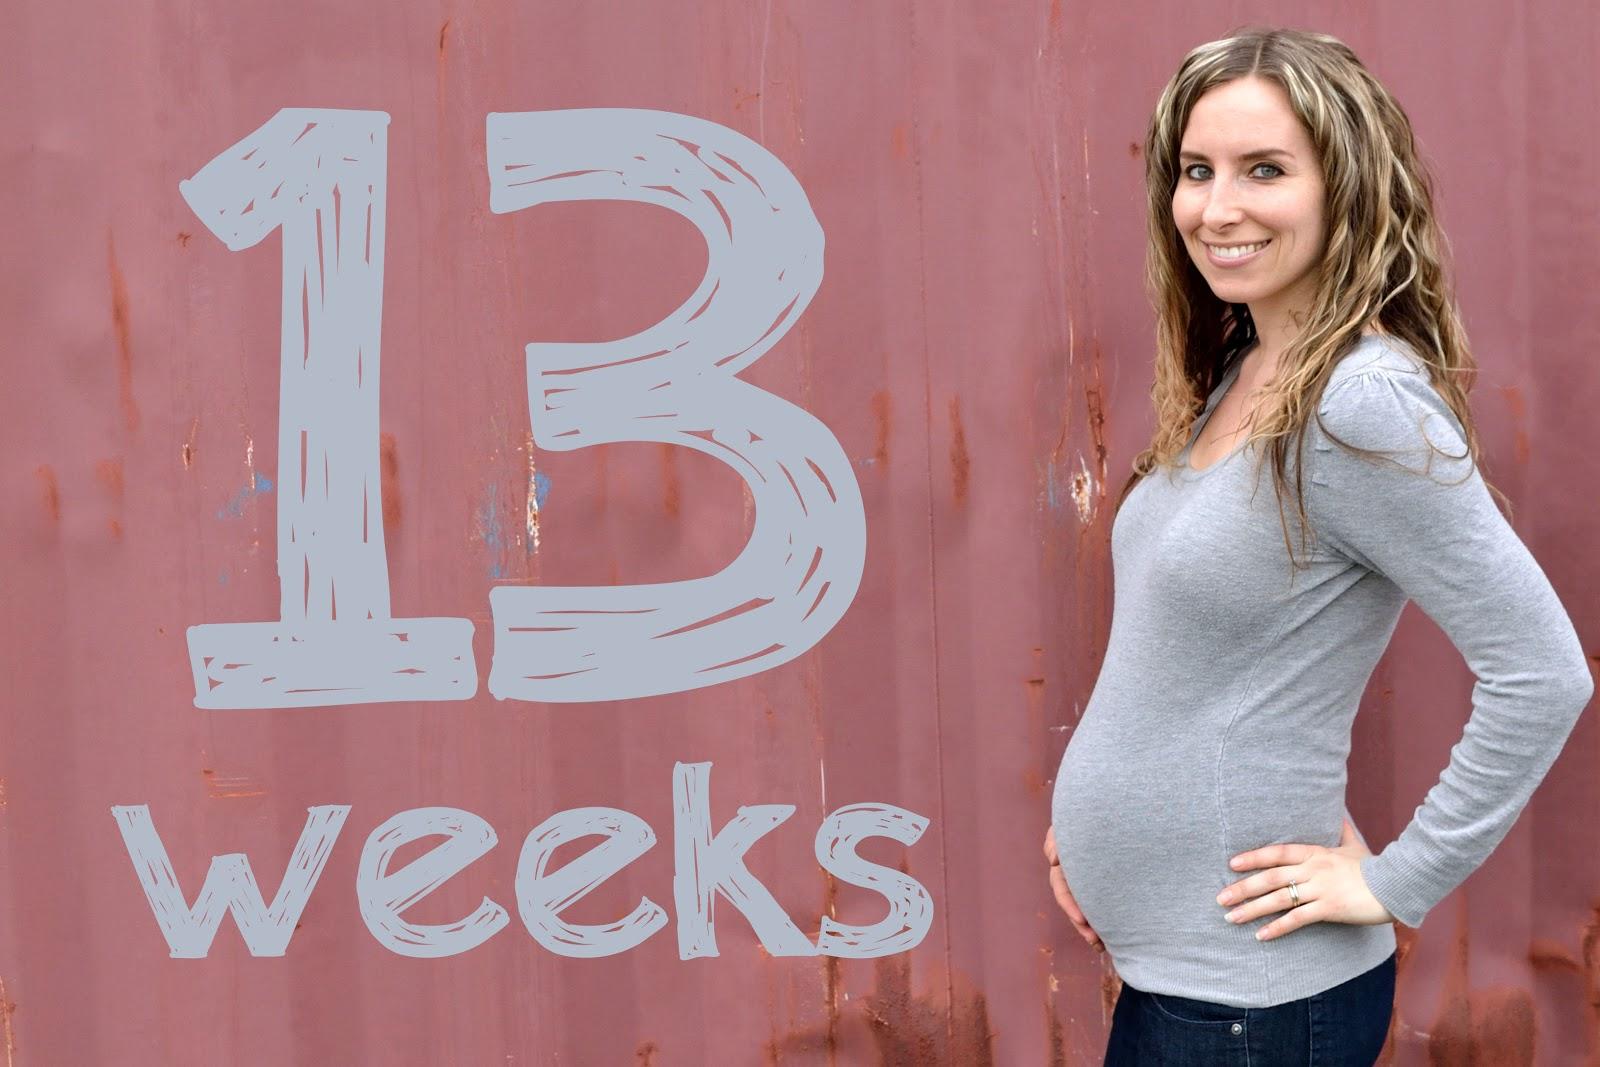 13 Weeks Pregnant Quotes. QuotesGram